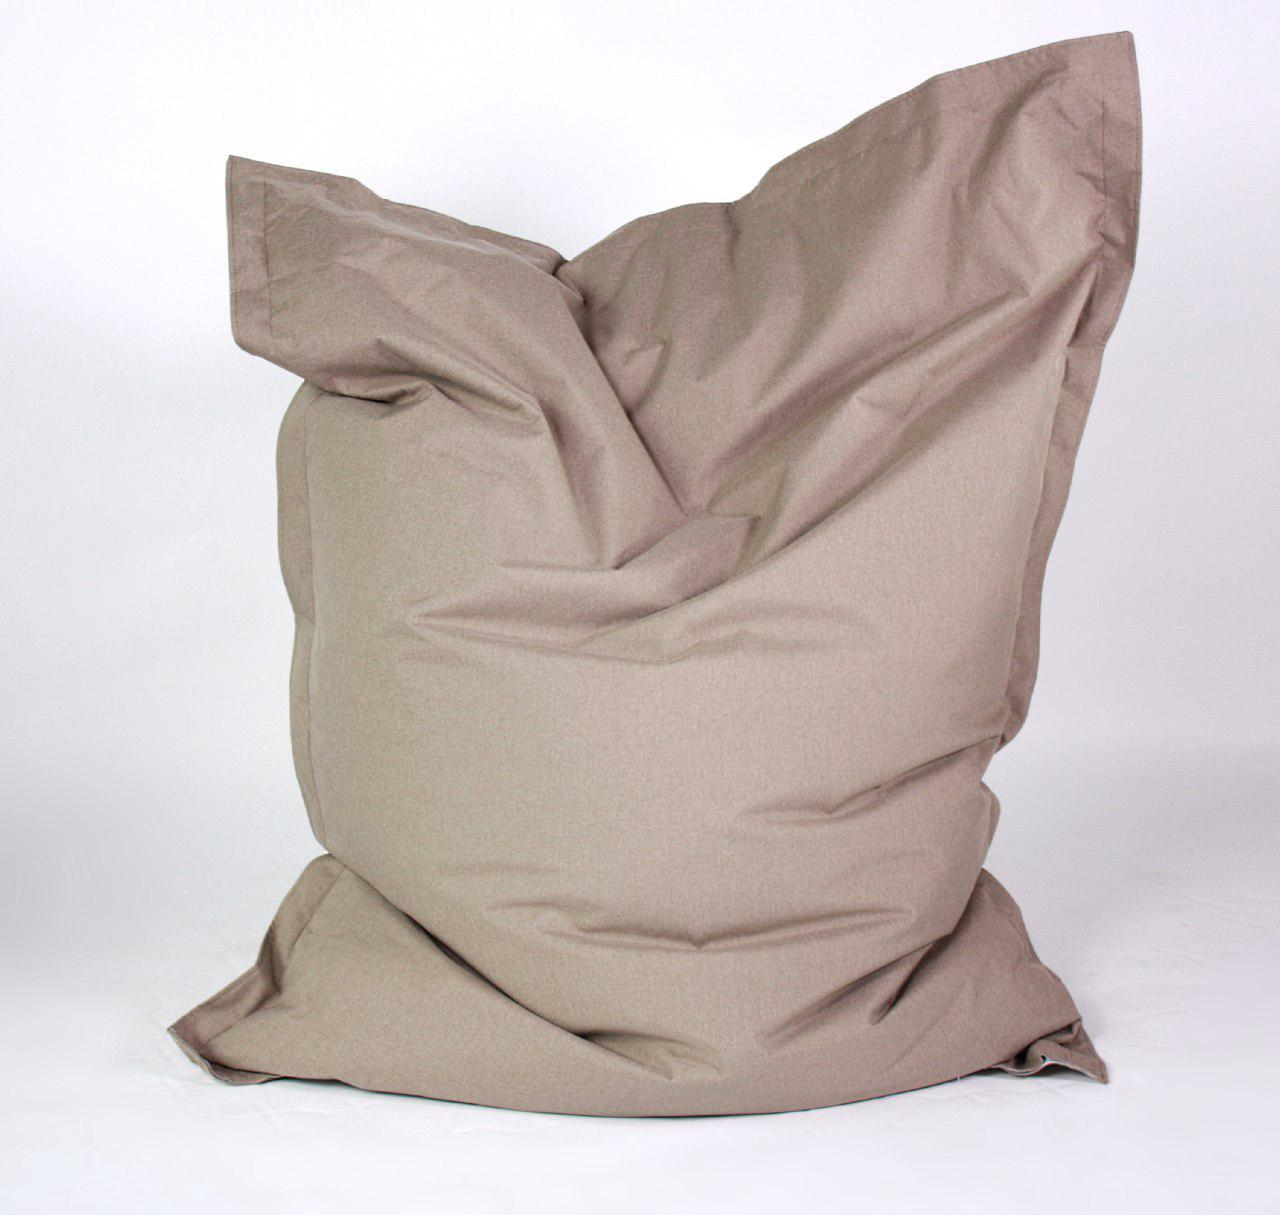 sitzsack outdoor orlando 180 x 140 outdoor sitzs cke von supersack. Black Bedroom Furniture Sets. Home Design Ideas